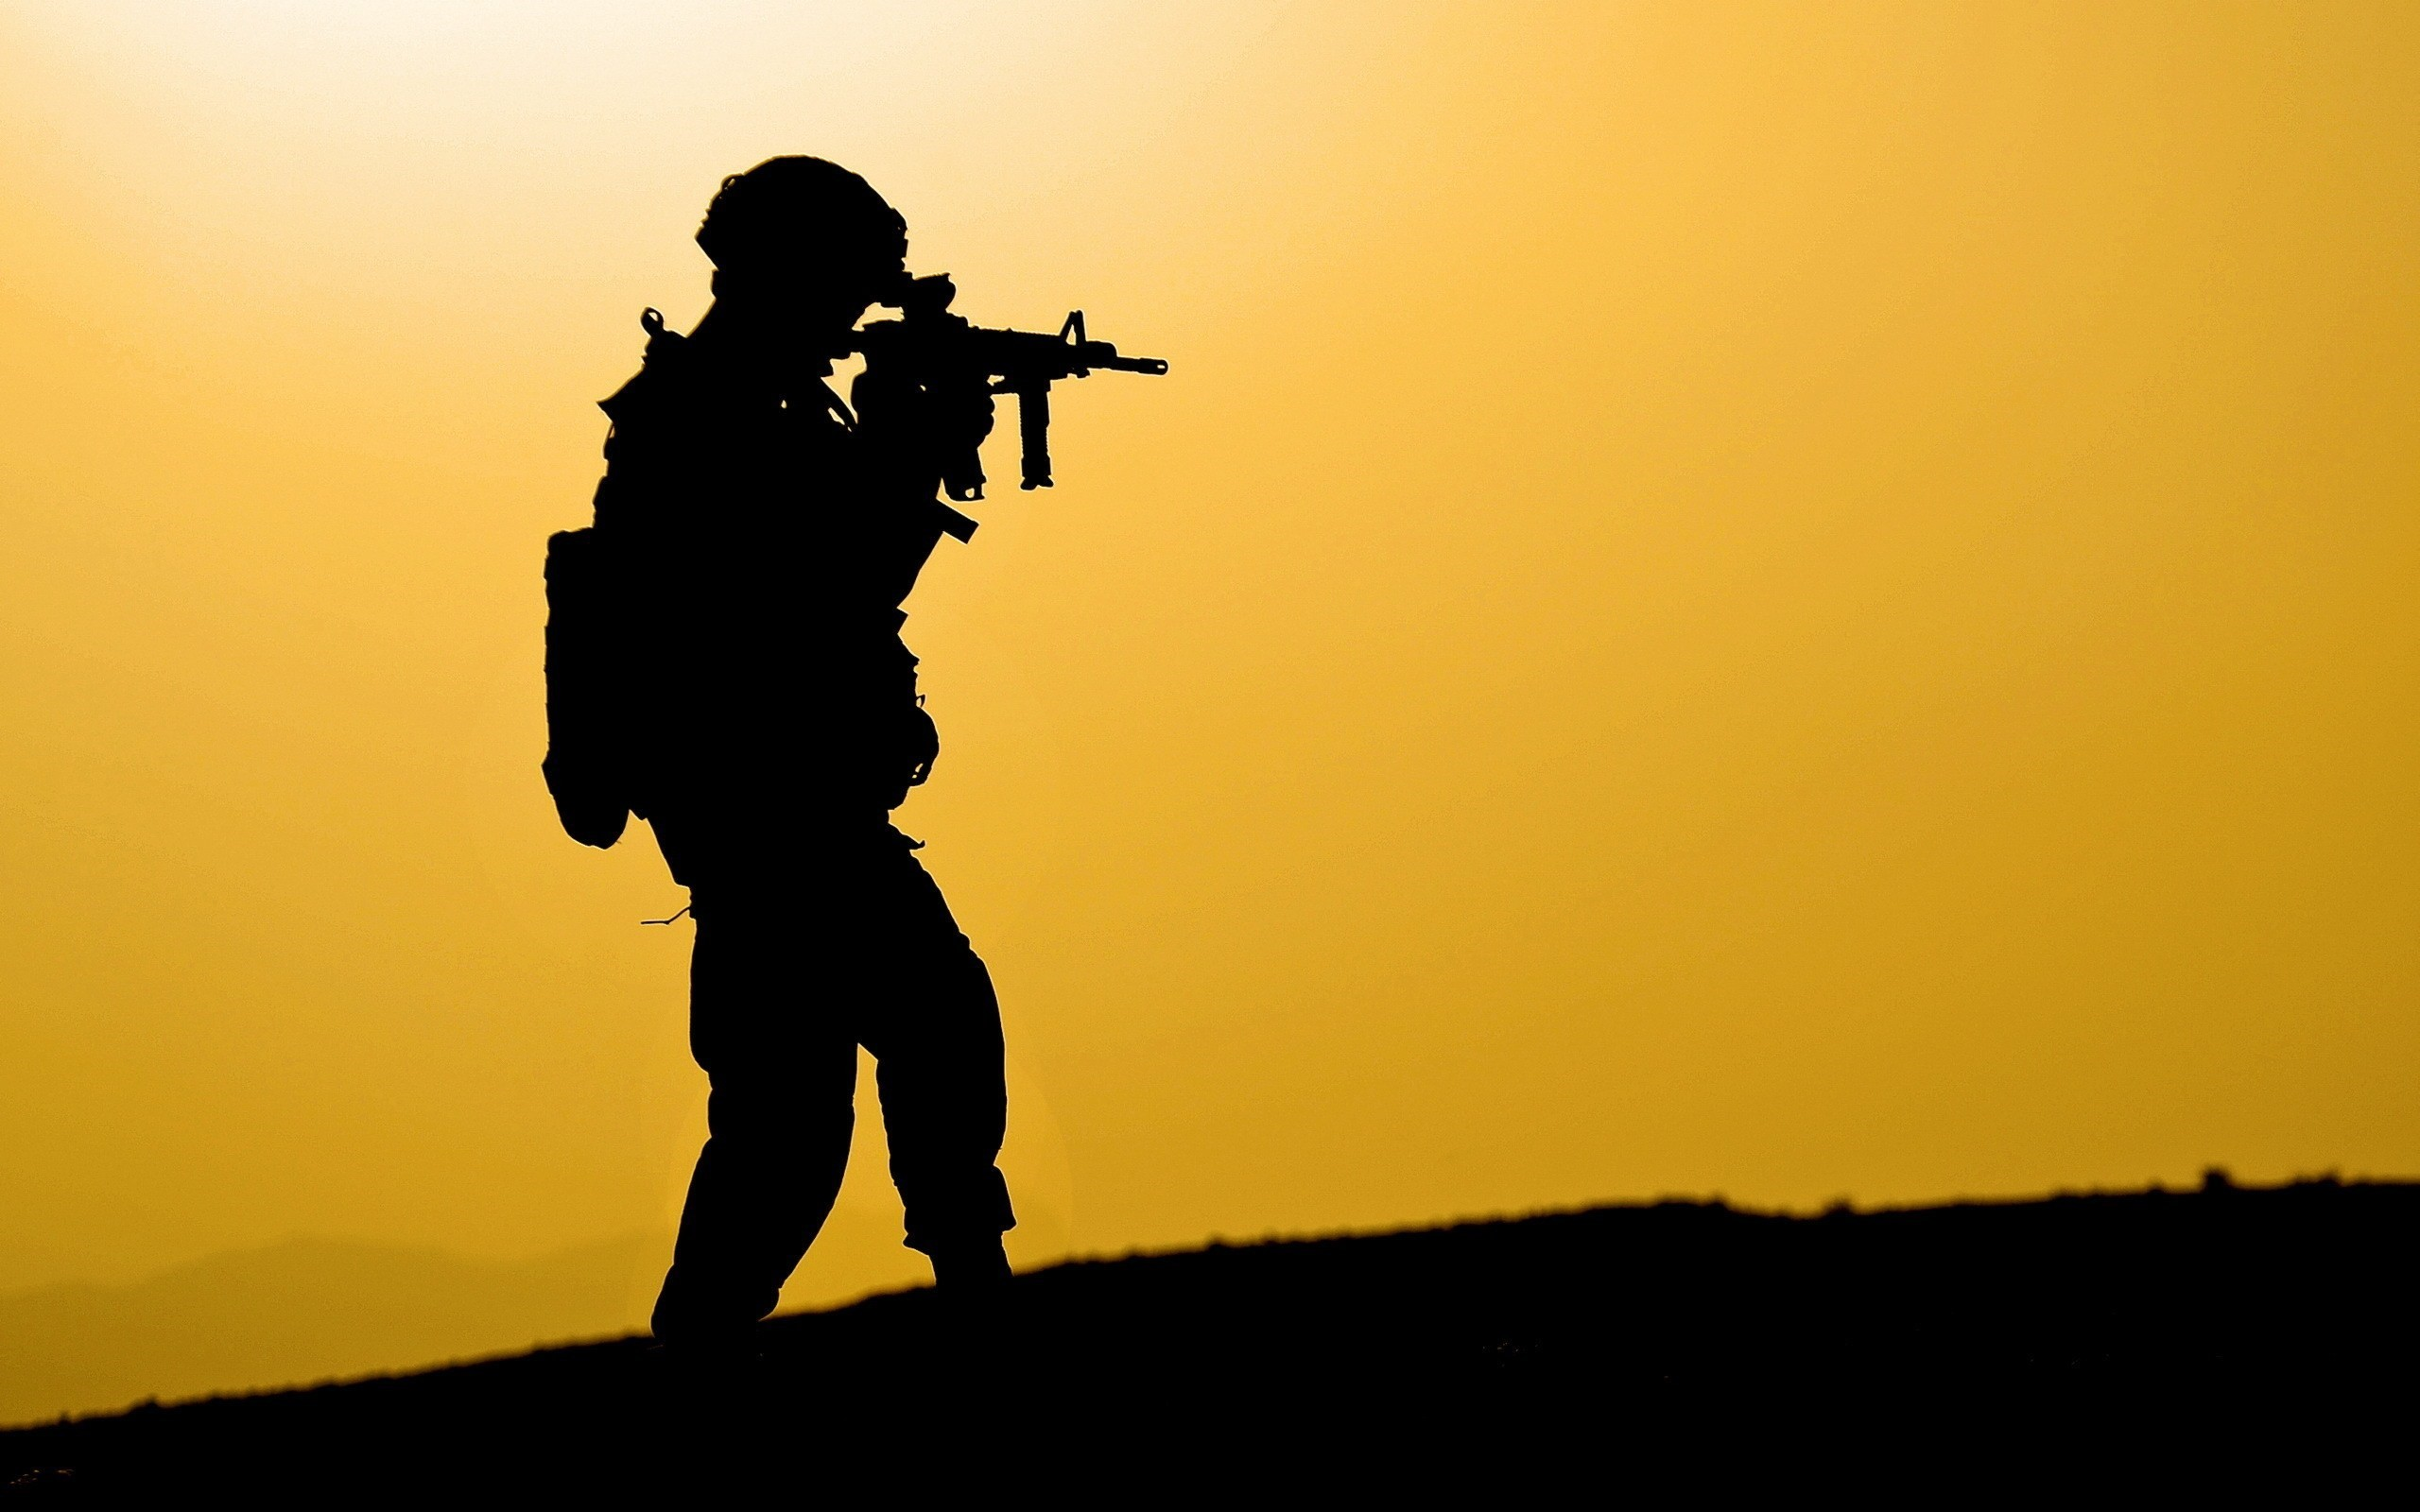 Soldier Wallpaper 43498